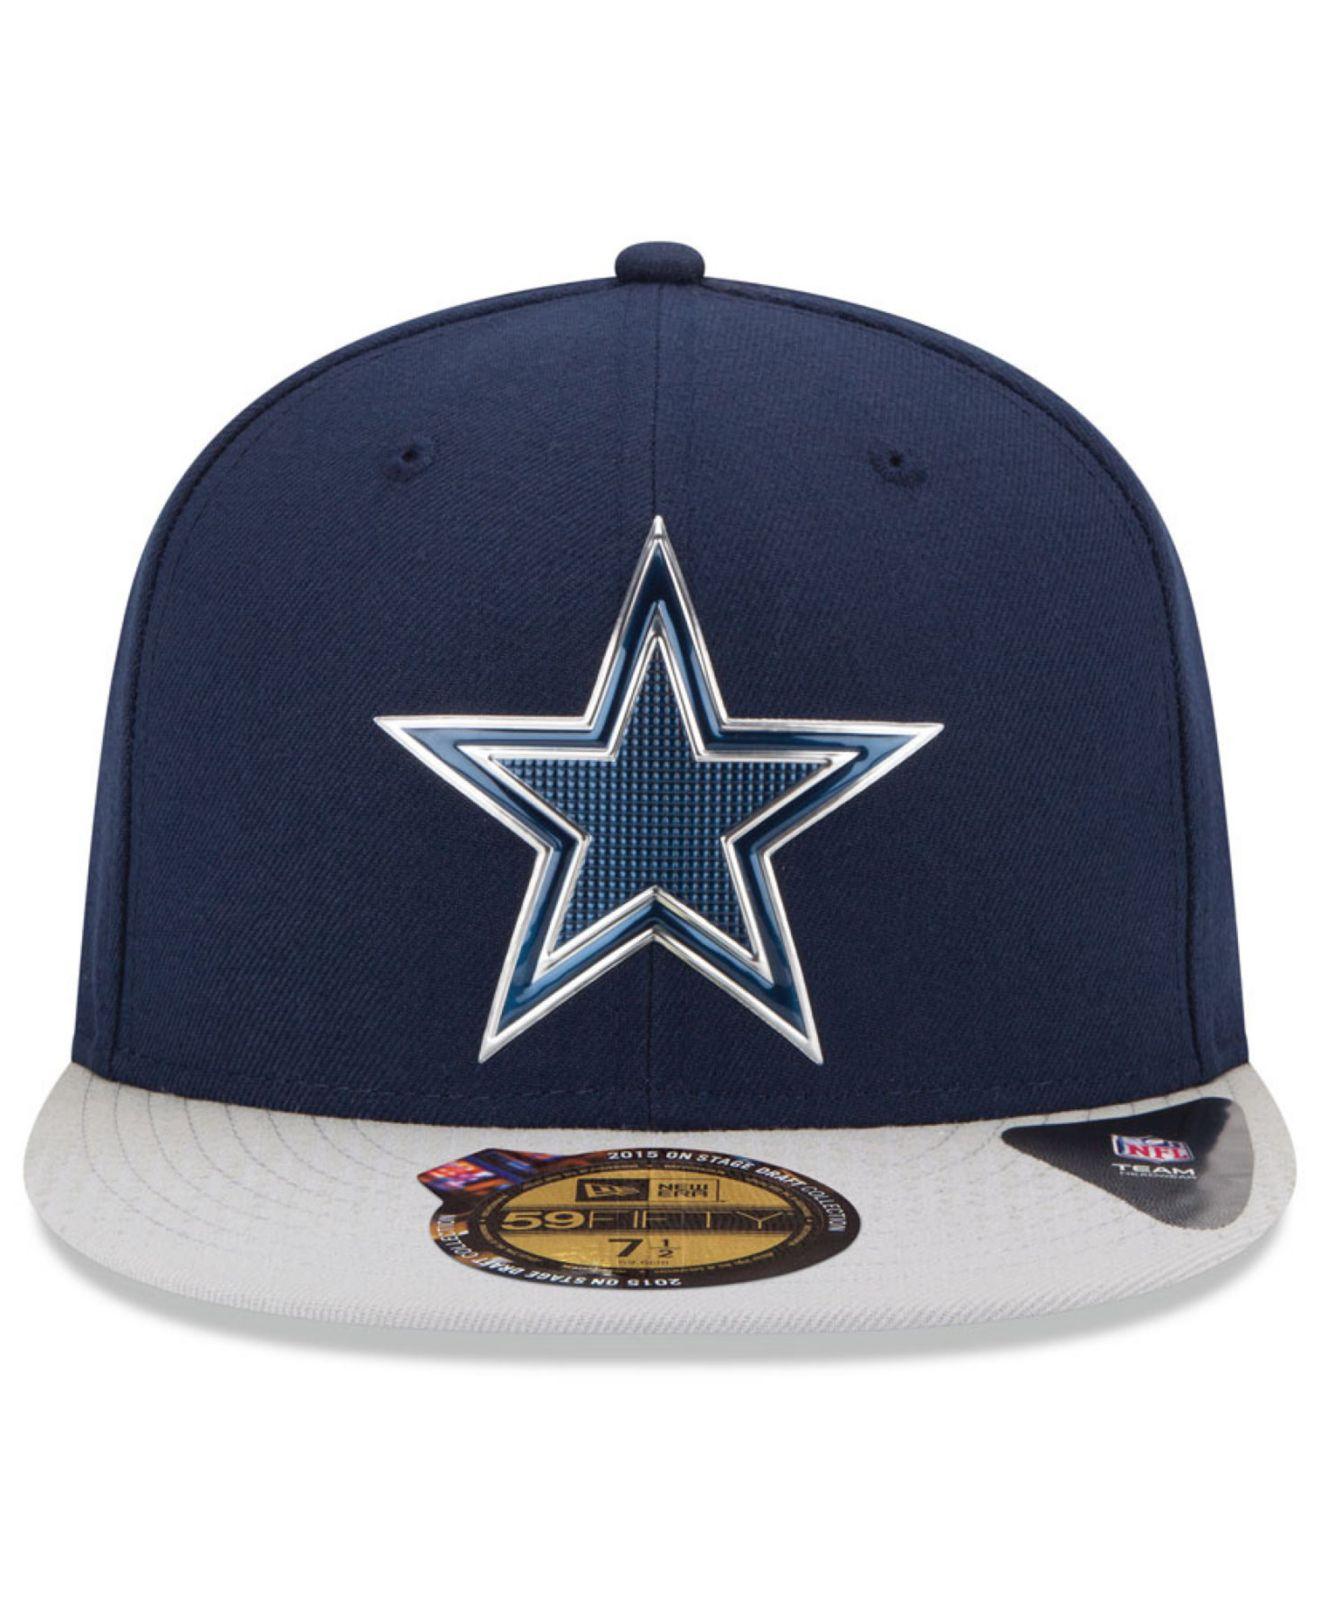 Lyst - Ktz Dallas Cowboys 2015 Nfl Draft 59fifty Cap in Blue for Men 615a2696b1c